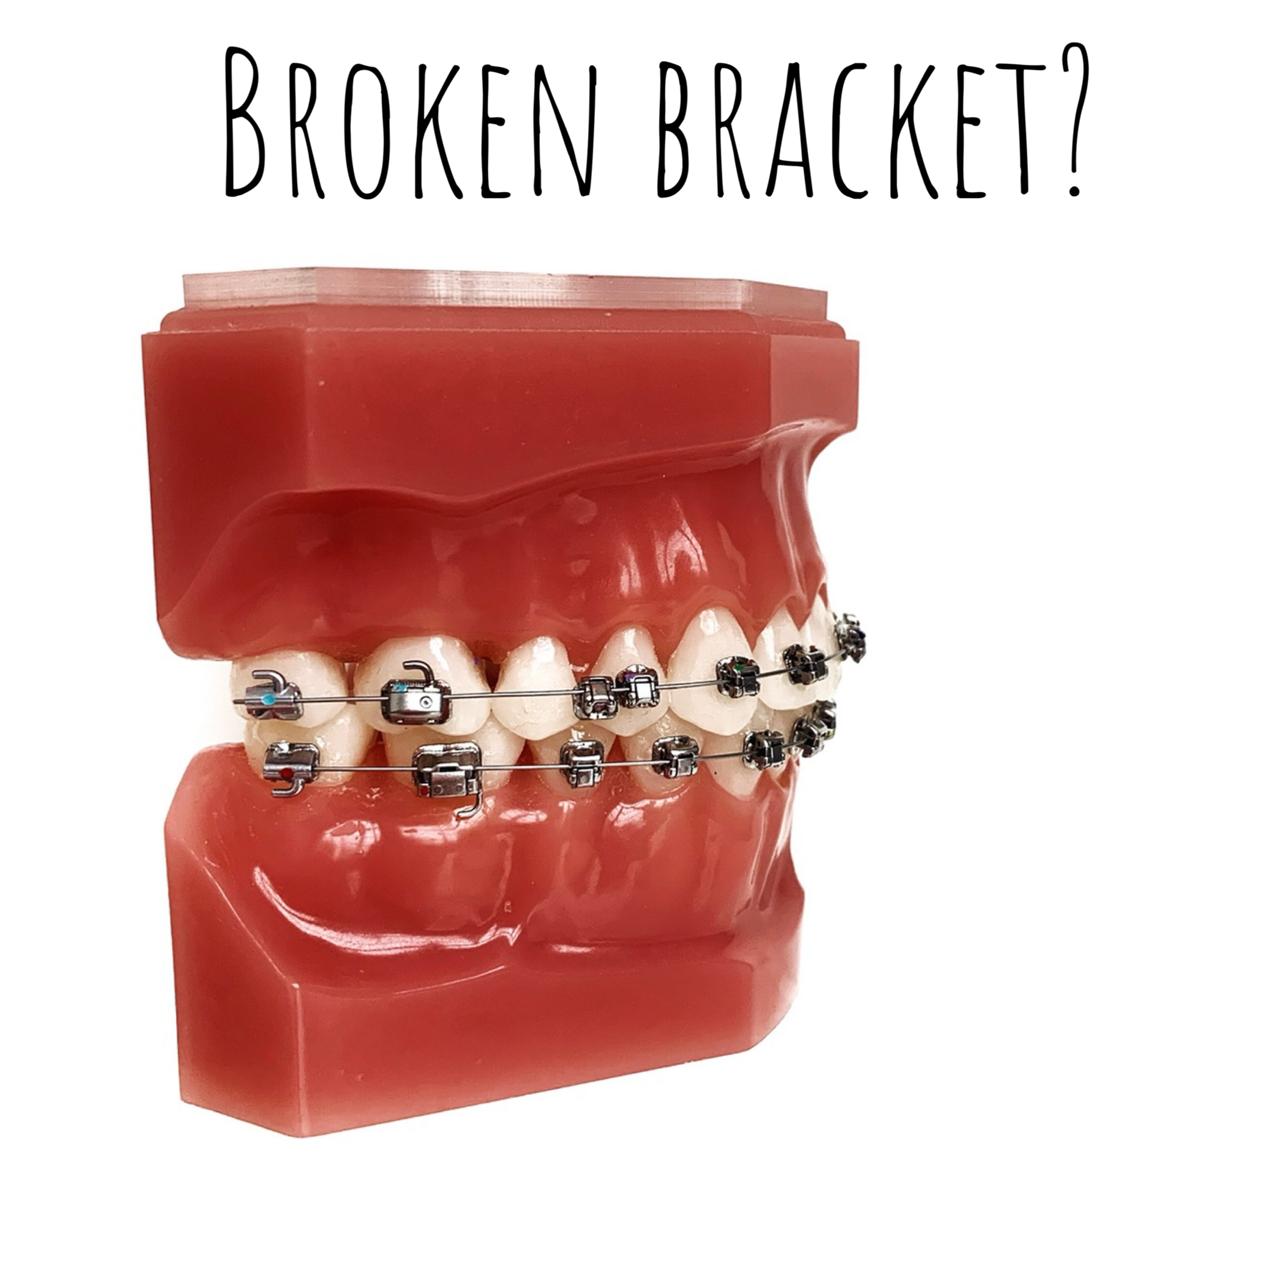 Loose Bracket?